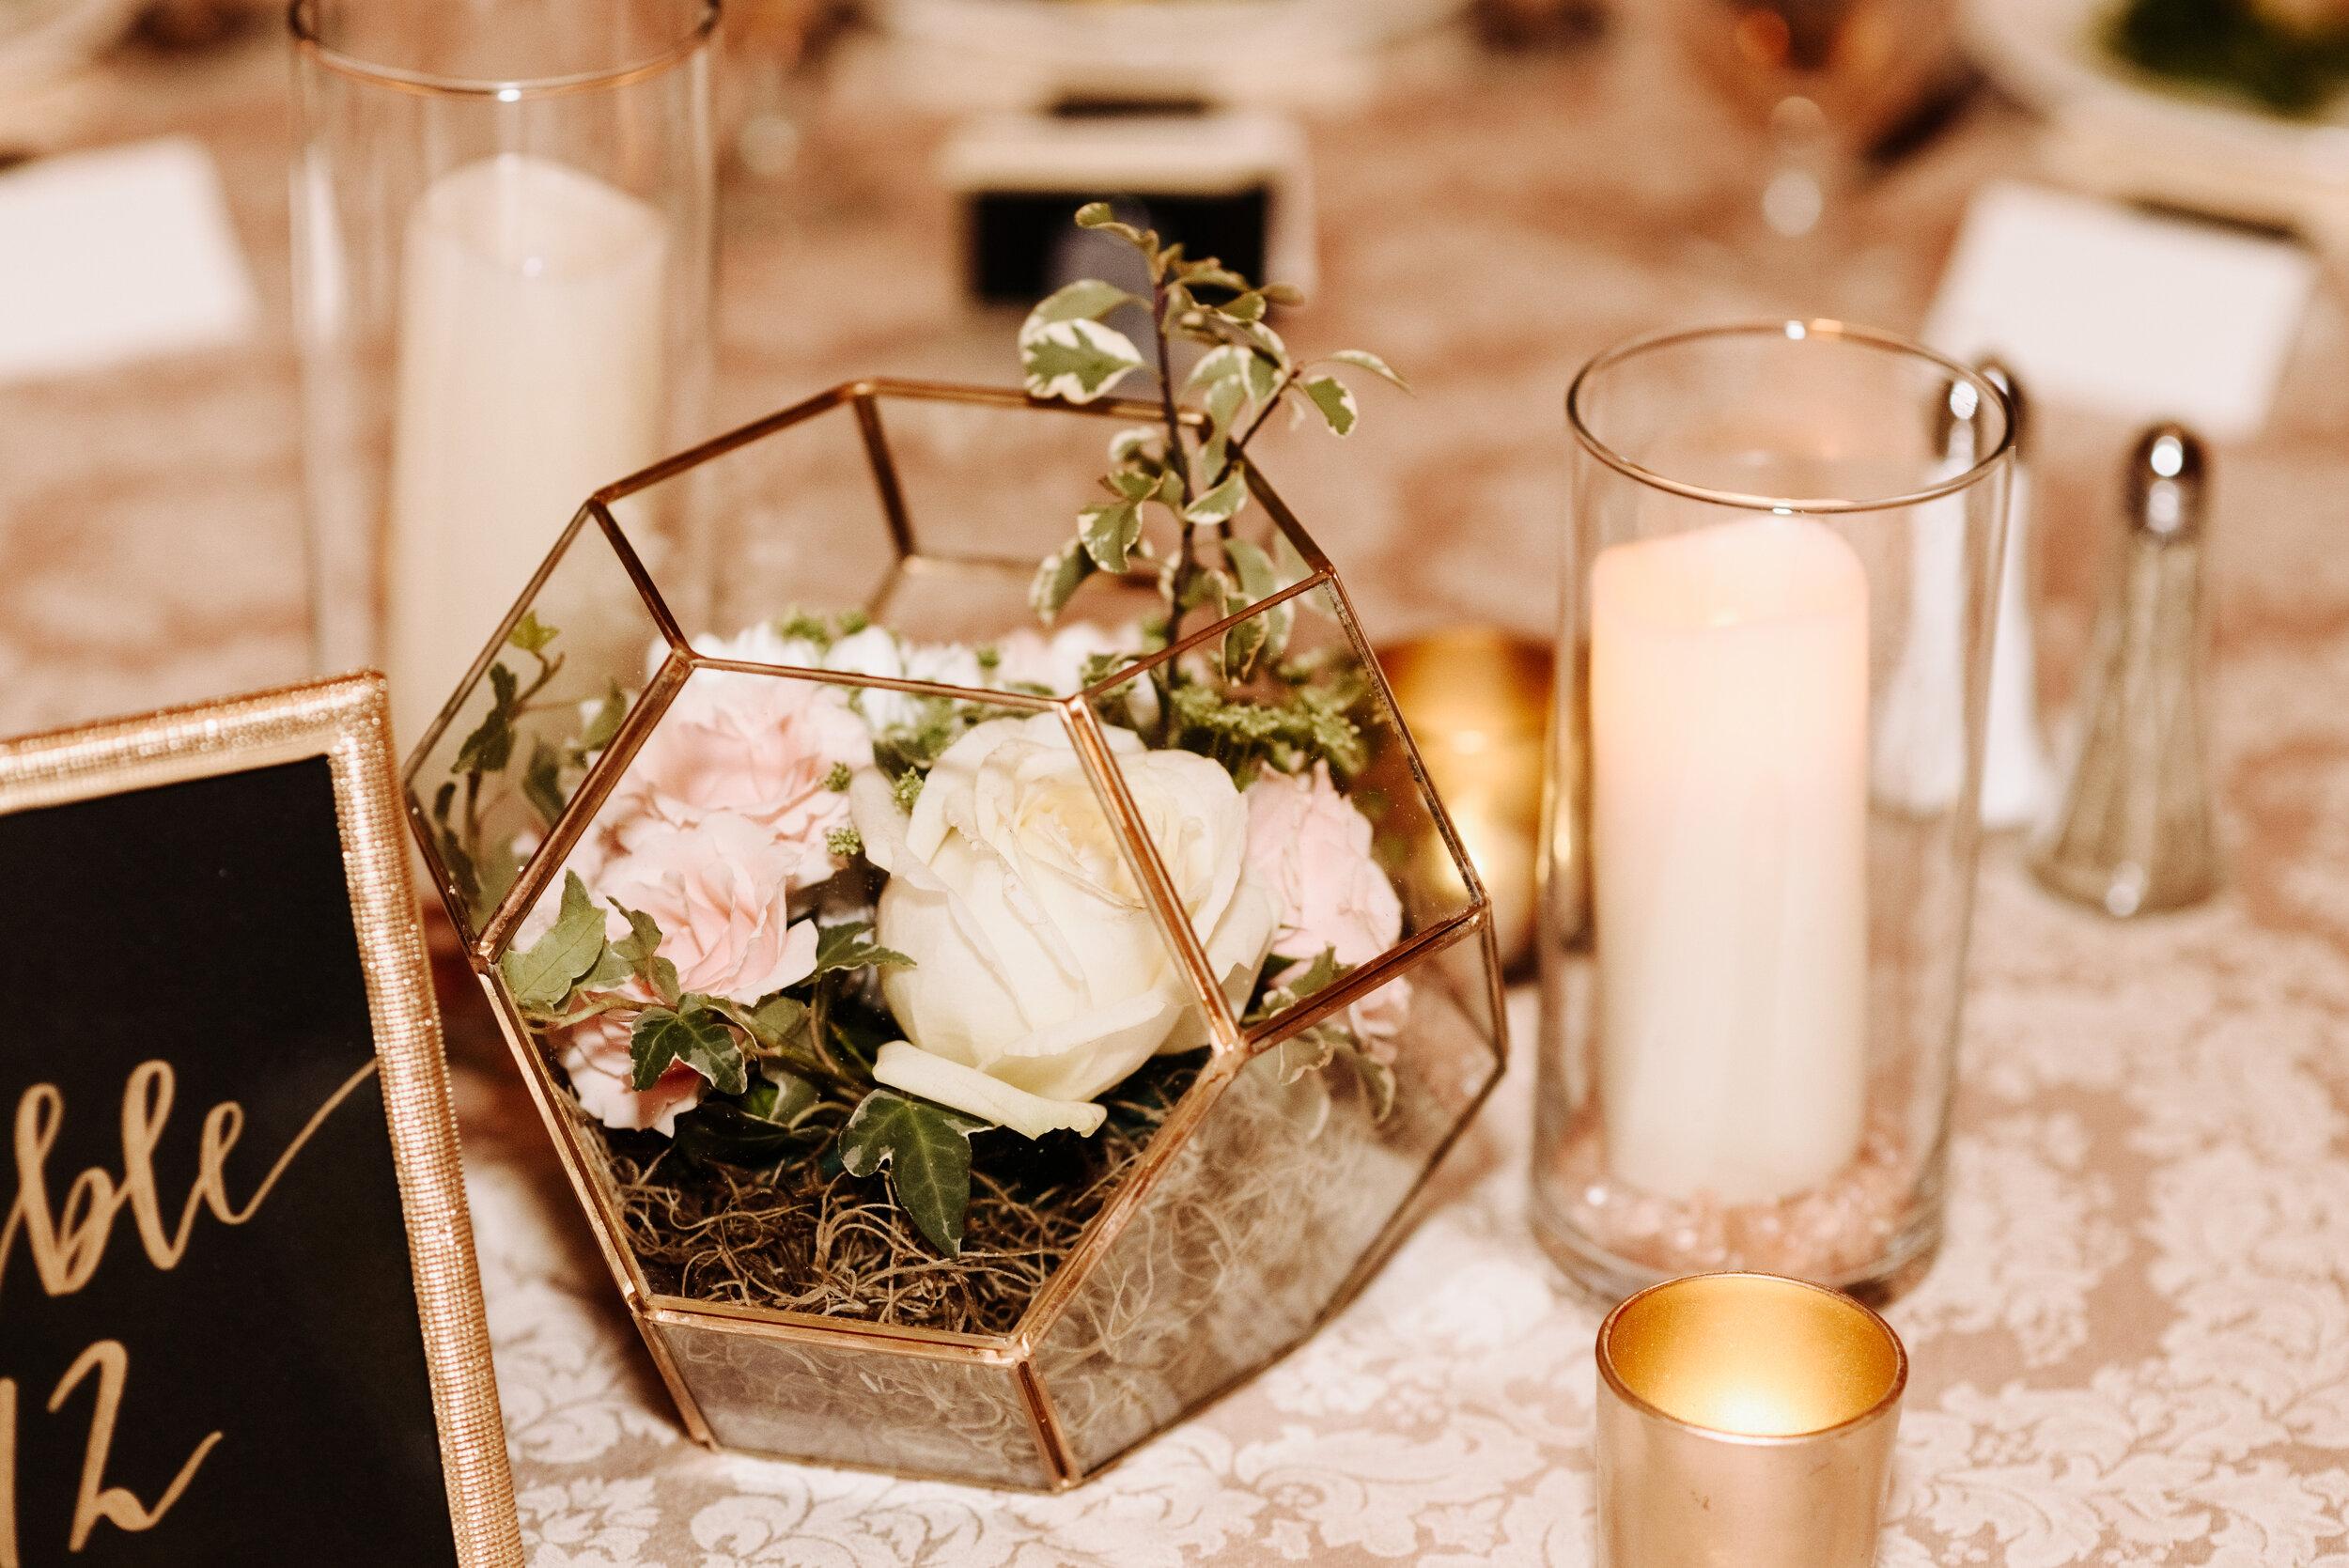 Cassie-Mrunal-Wedding-Quirk-Hotel-John-Marshall-Ballrooms-Richmond-Virginia-Photography-by-V-87.jpg